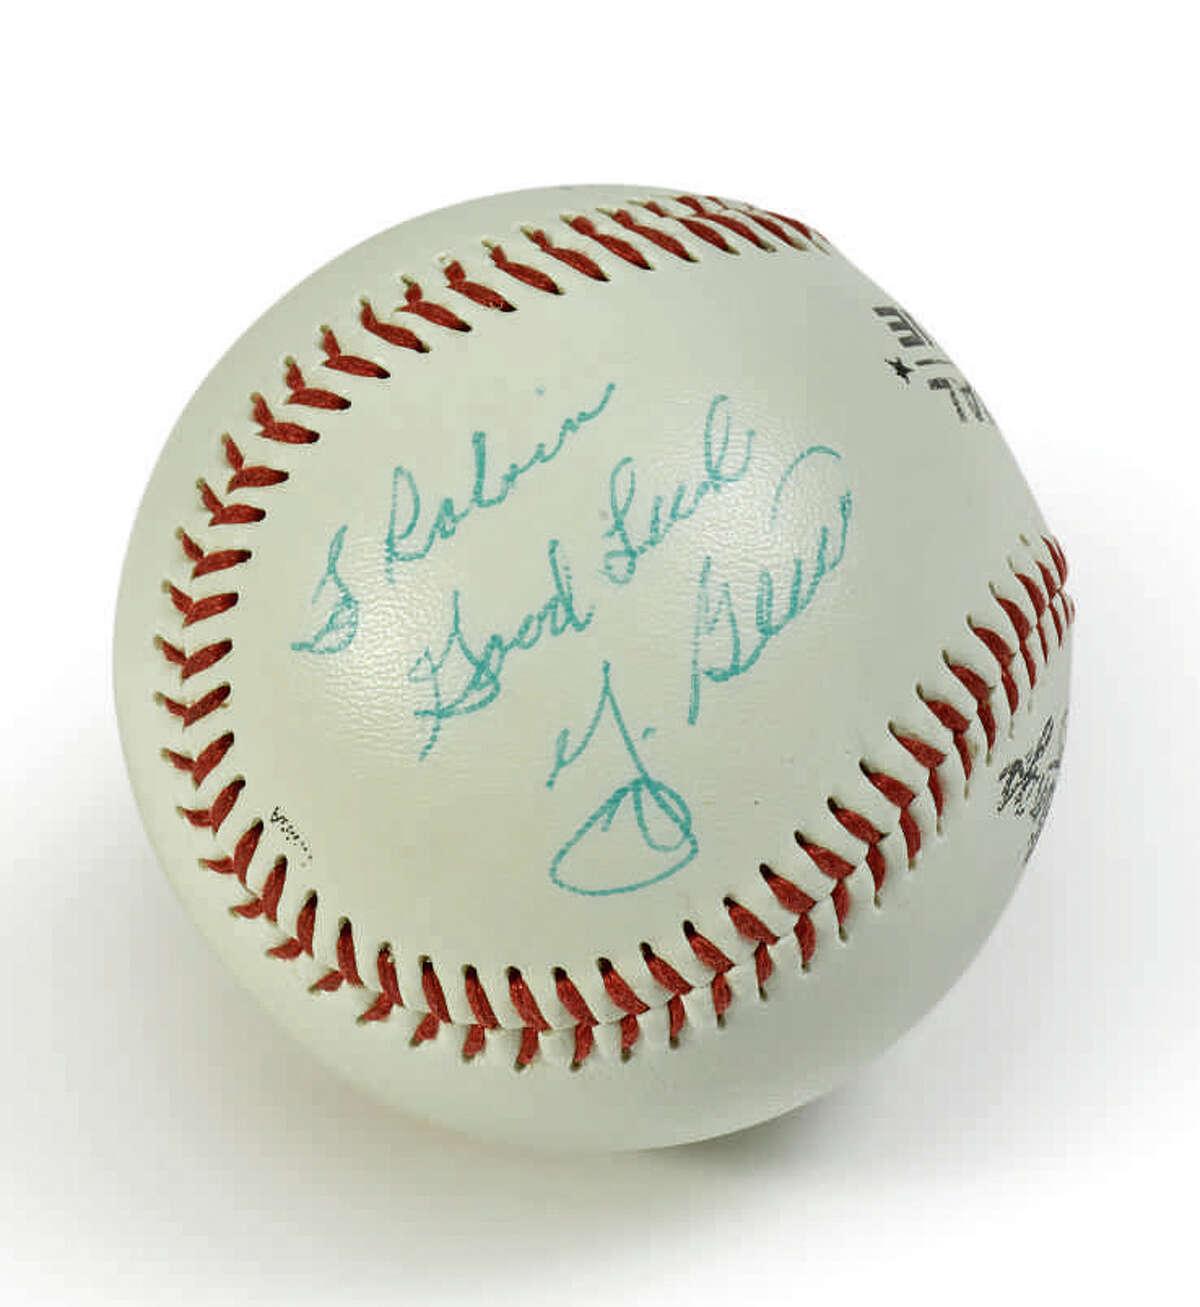 Description: Yogi Berra Baseball Official Rawlings League ball in Lucite display cube Signed